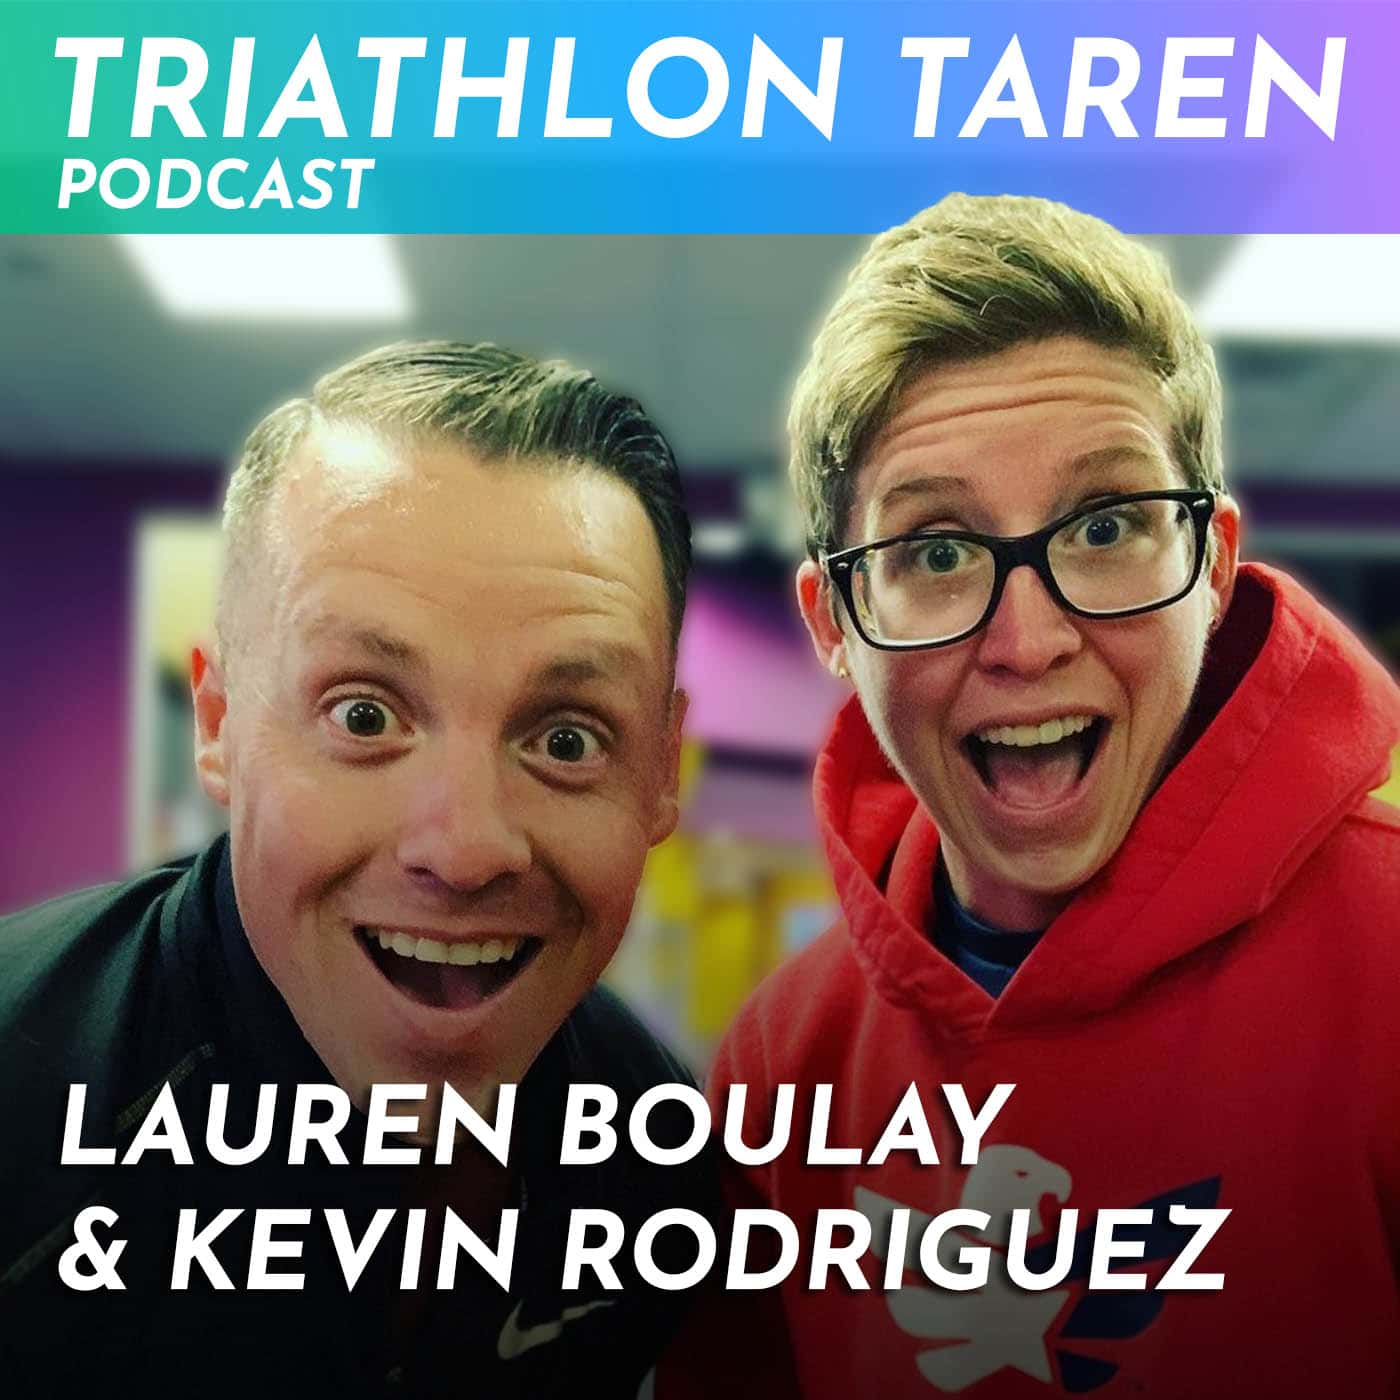 Lauren Boulay & Kevin Rodriguez